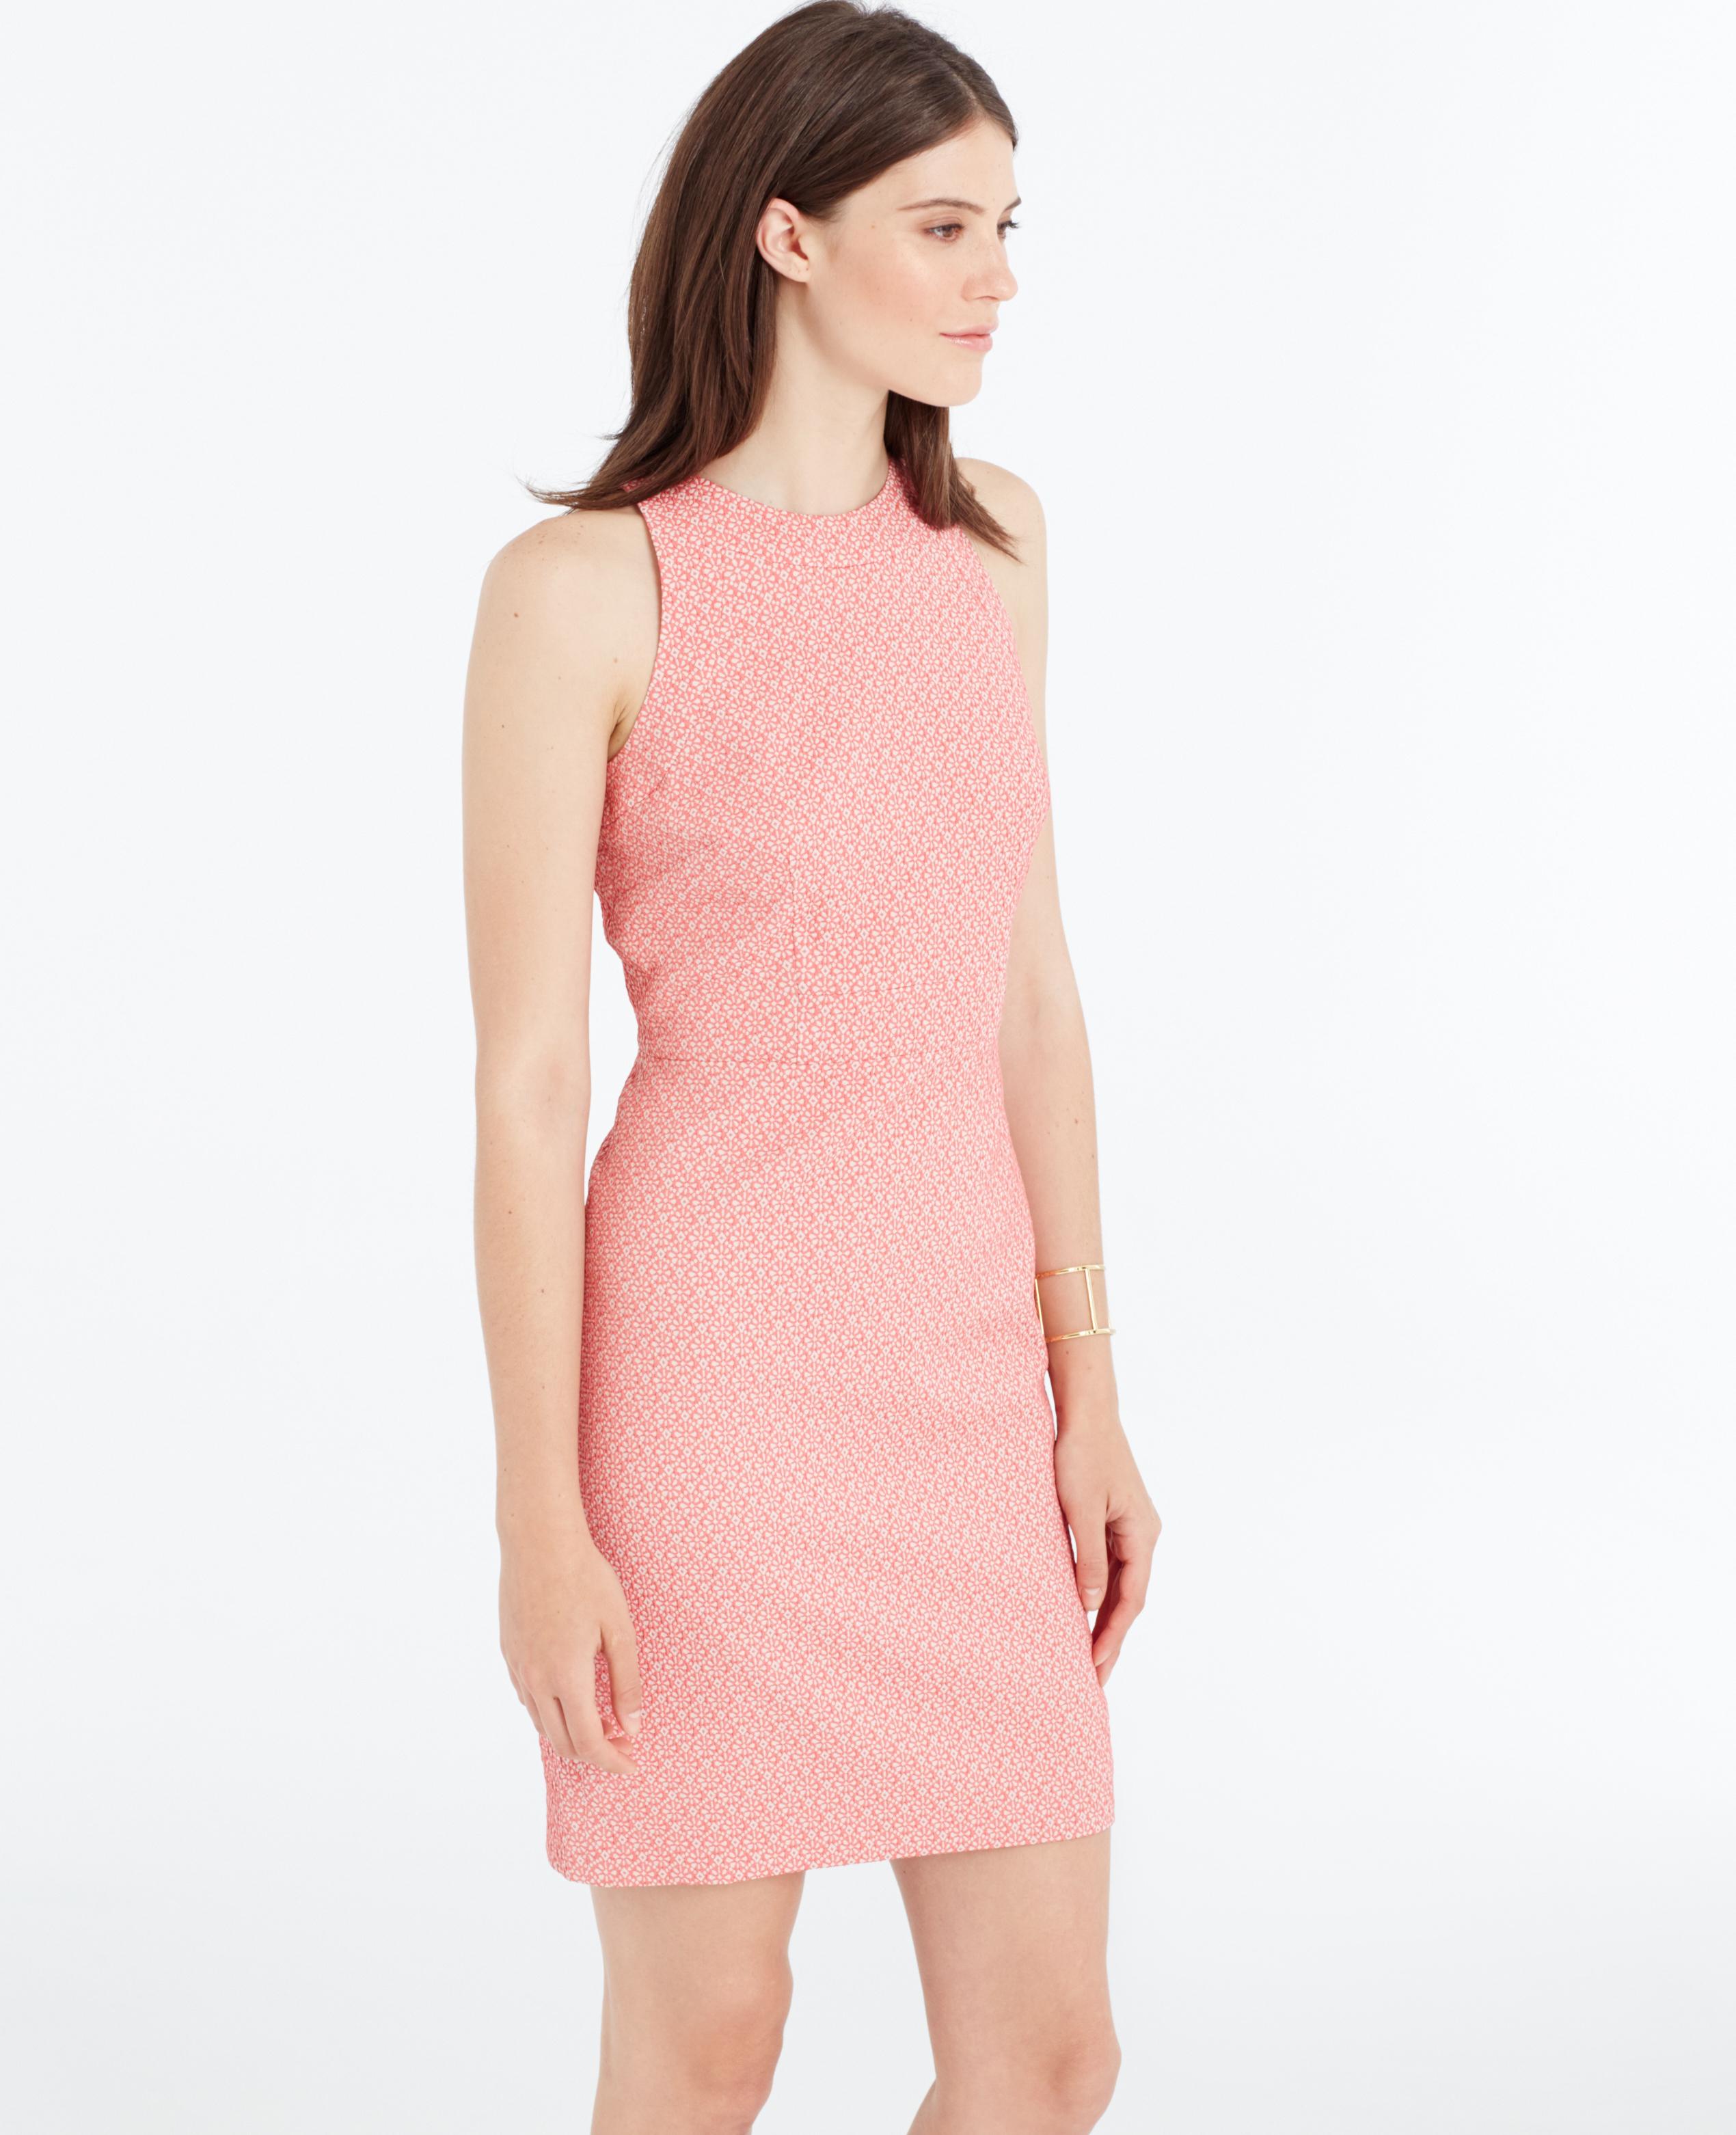 Dorable Cocktail Dresses Ann Taylor Imágenes - Ideas de Vestido para ...